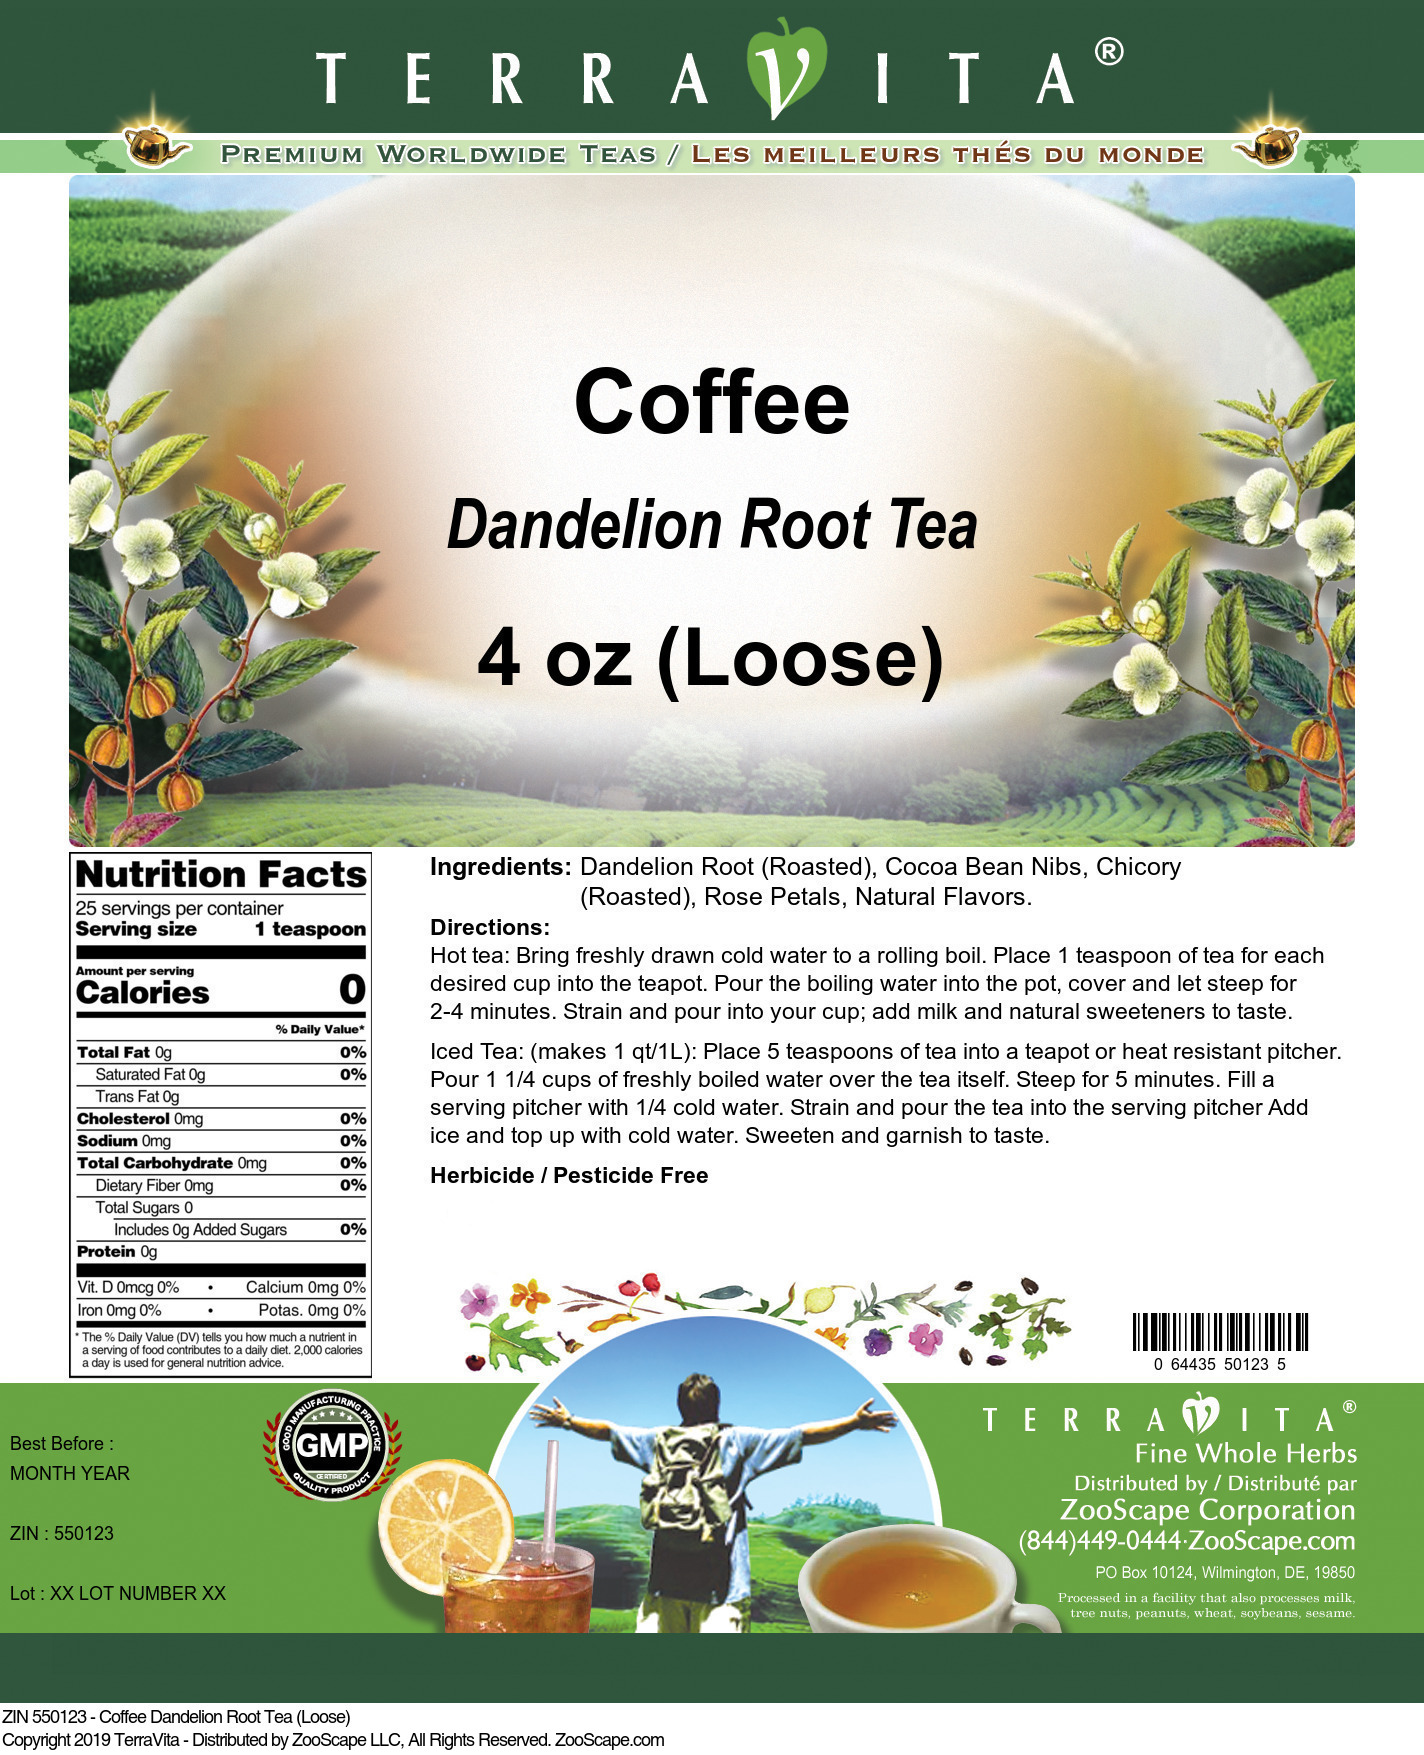 Coffee Dandelion Root